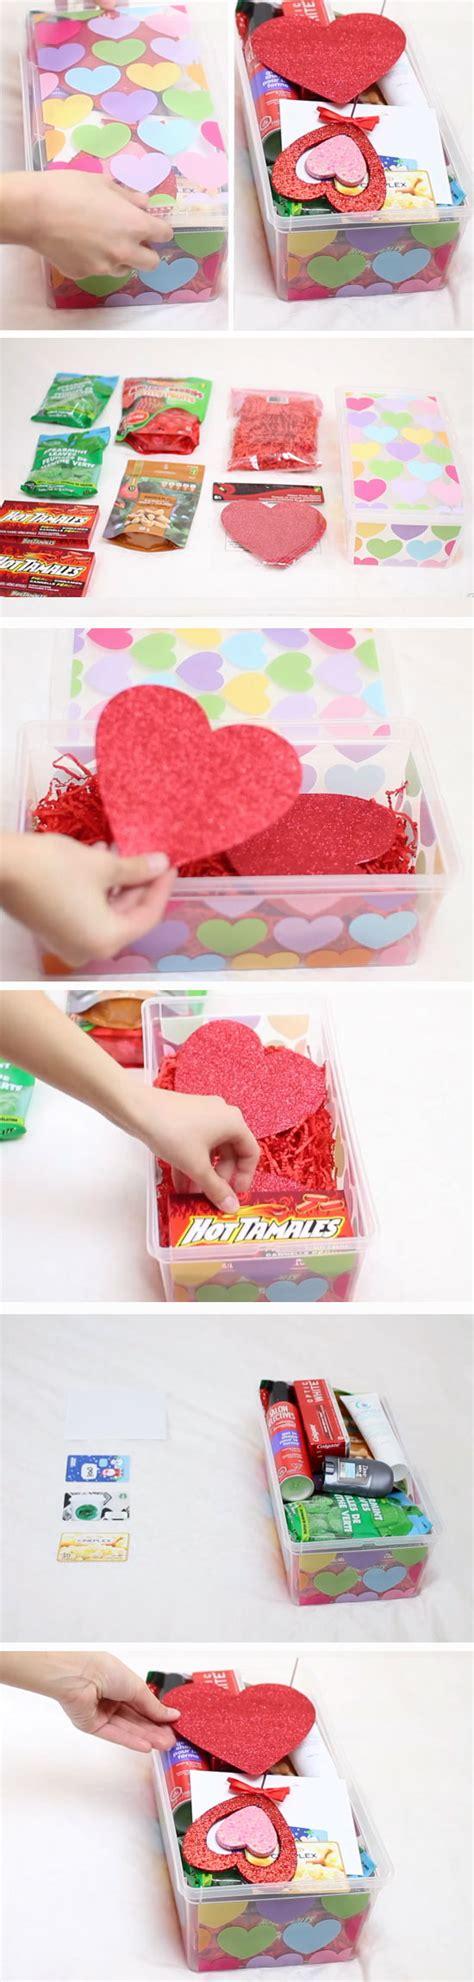 25 romantic diy valentine s gifts for him 2017 diy valentine gift for boyfriend www pixshark com